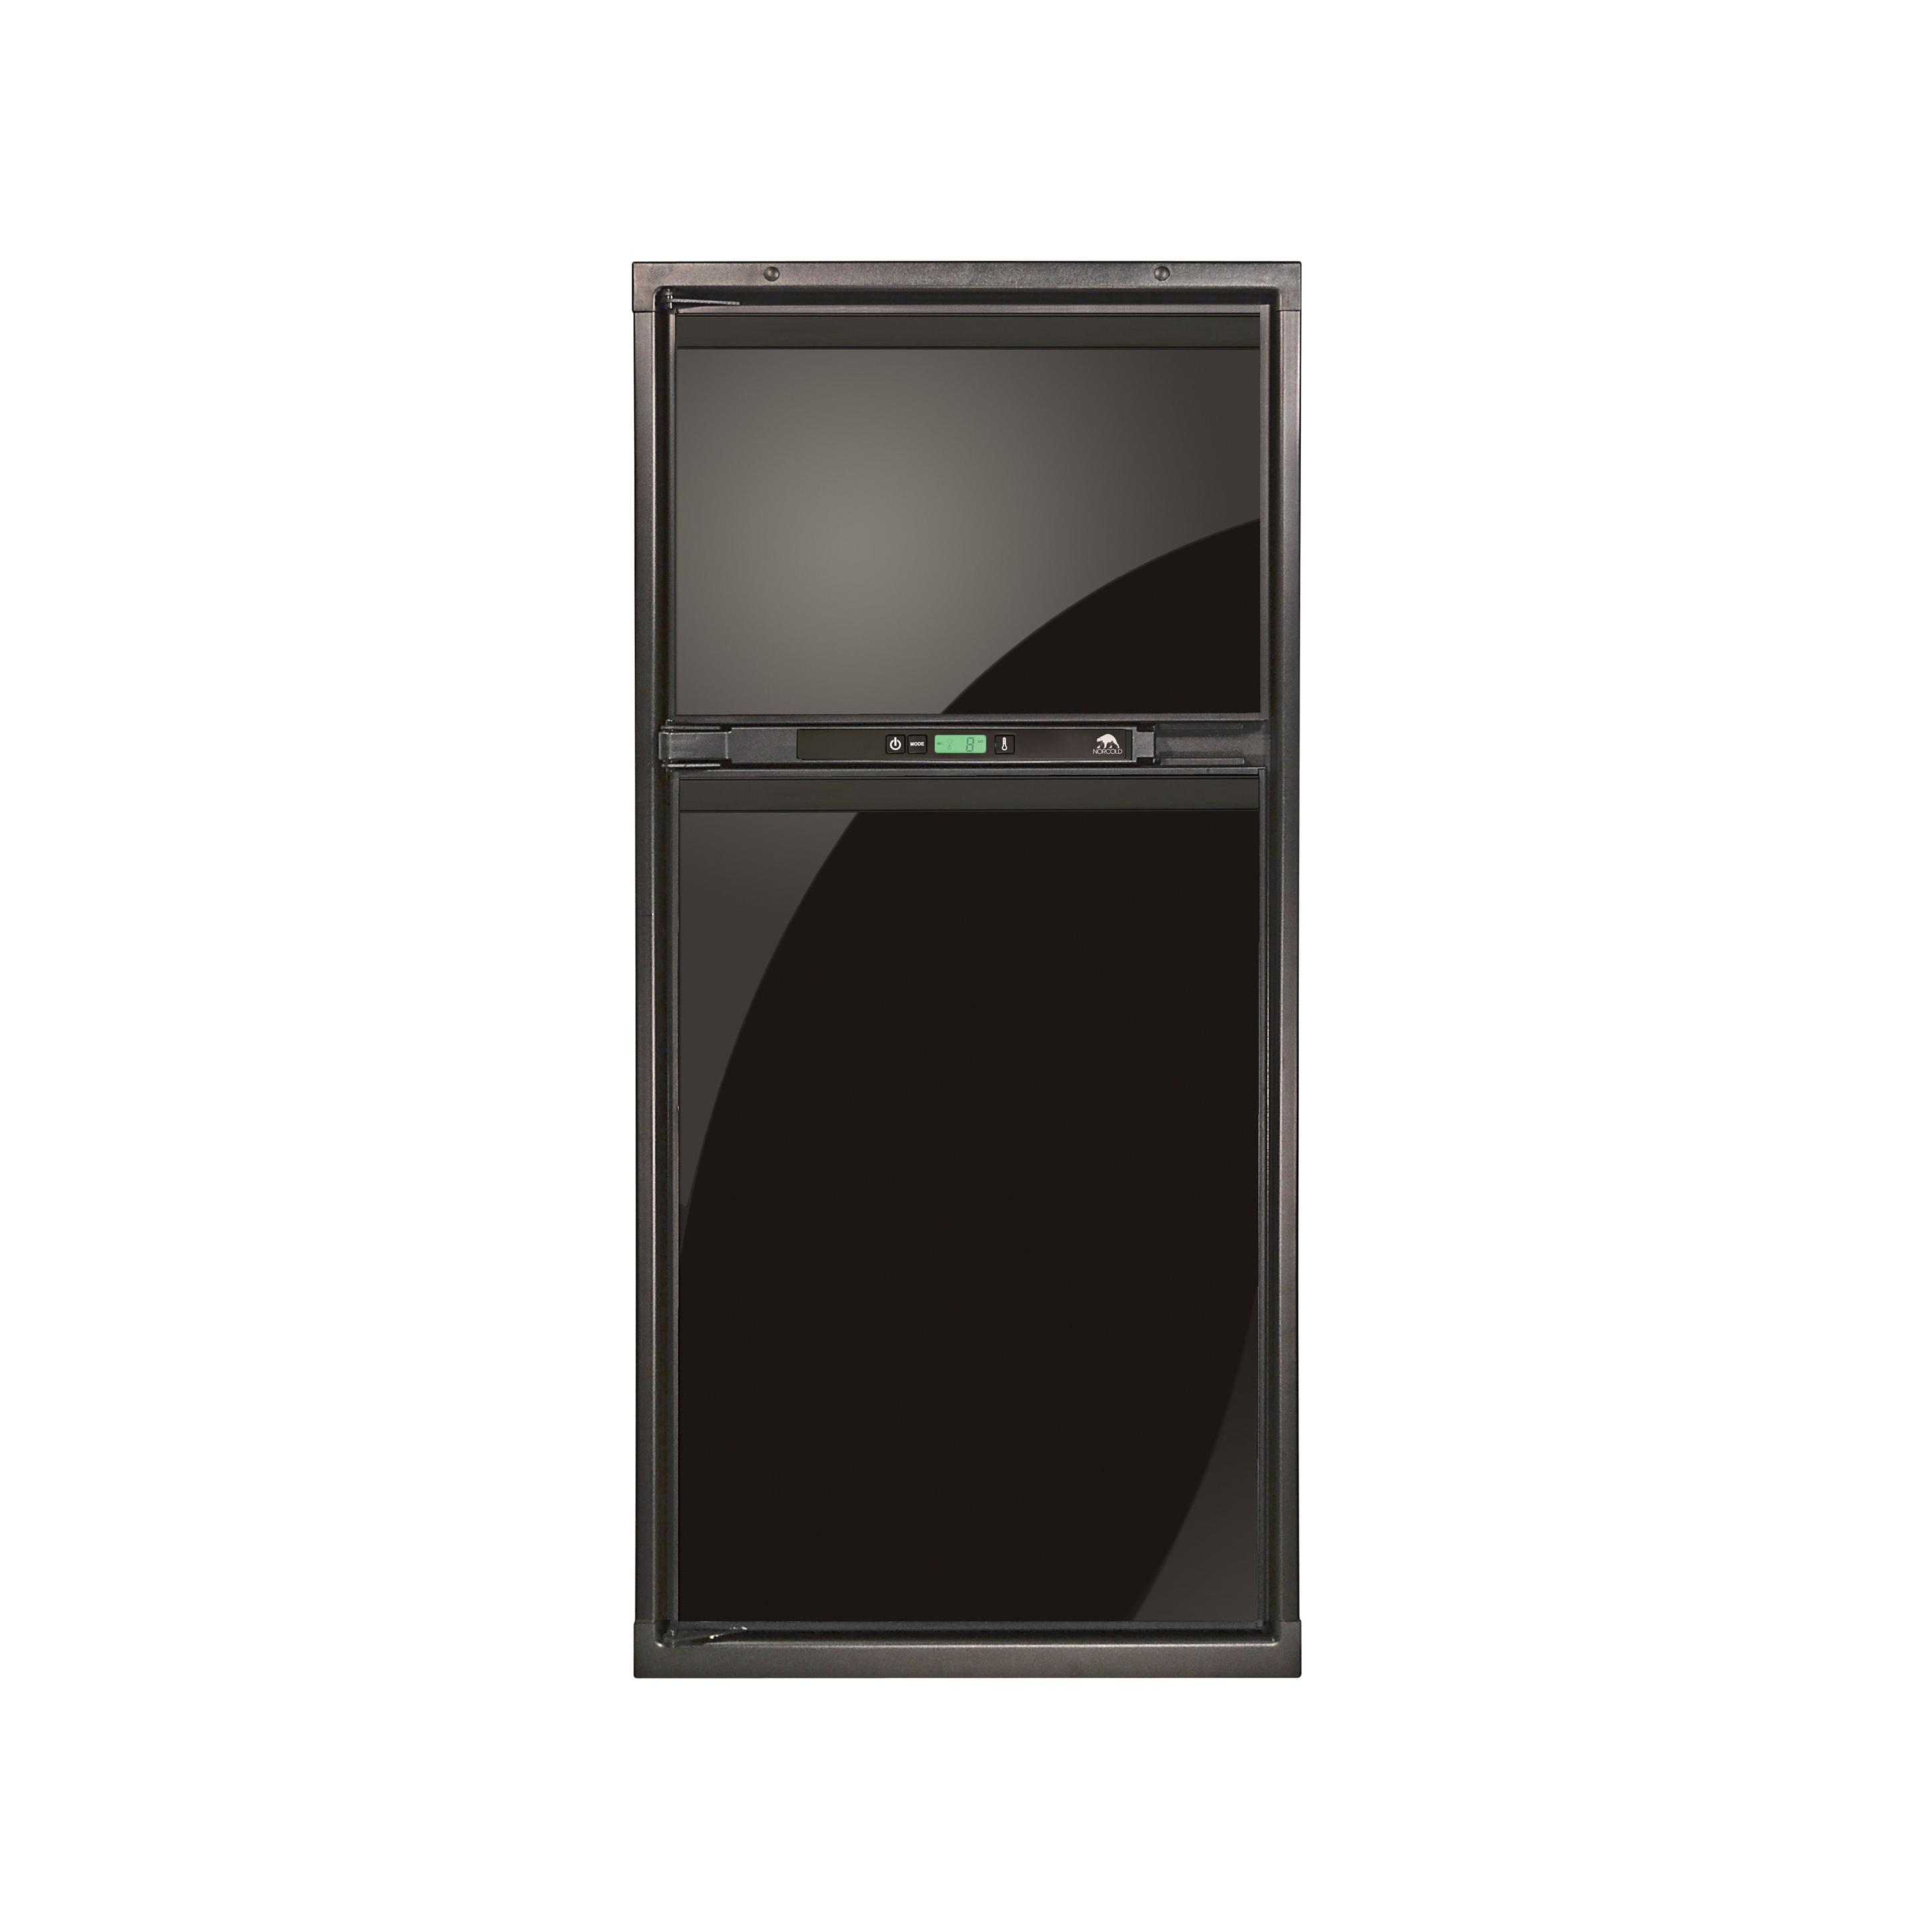 Fits NXA641//NXA841 Models Upper Black Acrylic Norcold 636216 Refrigerator Door Panel